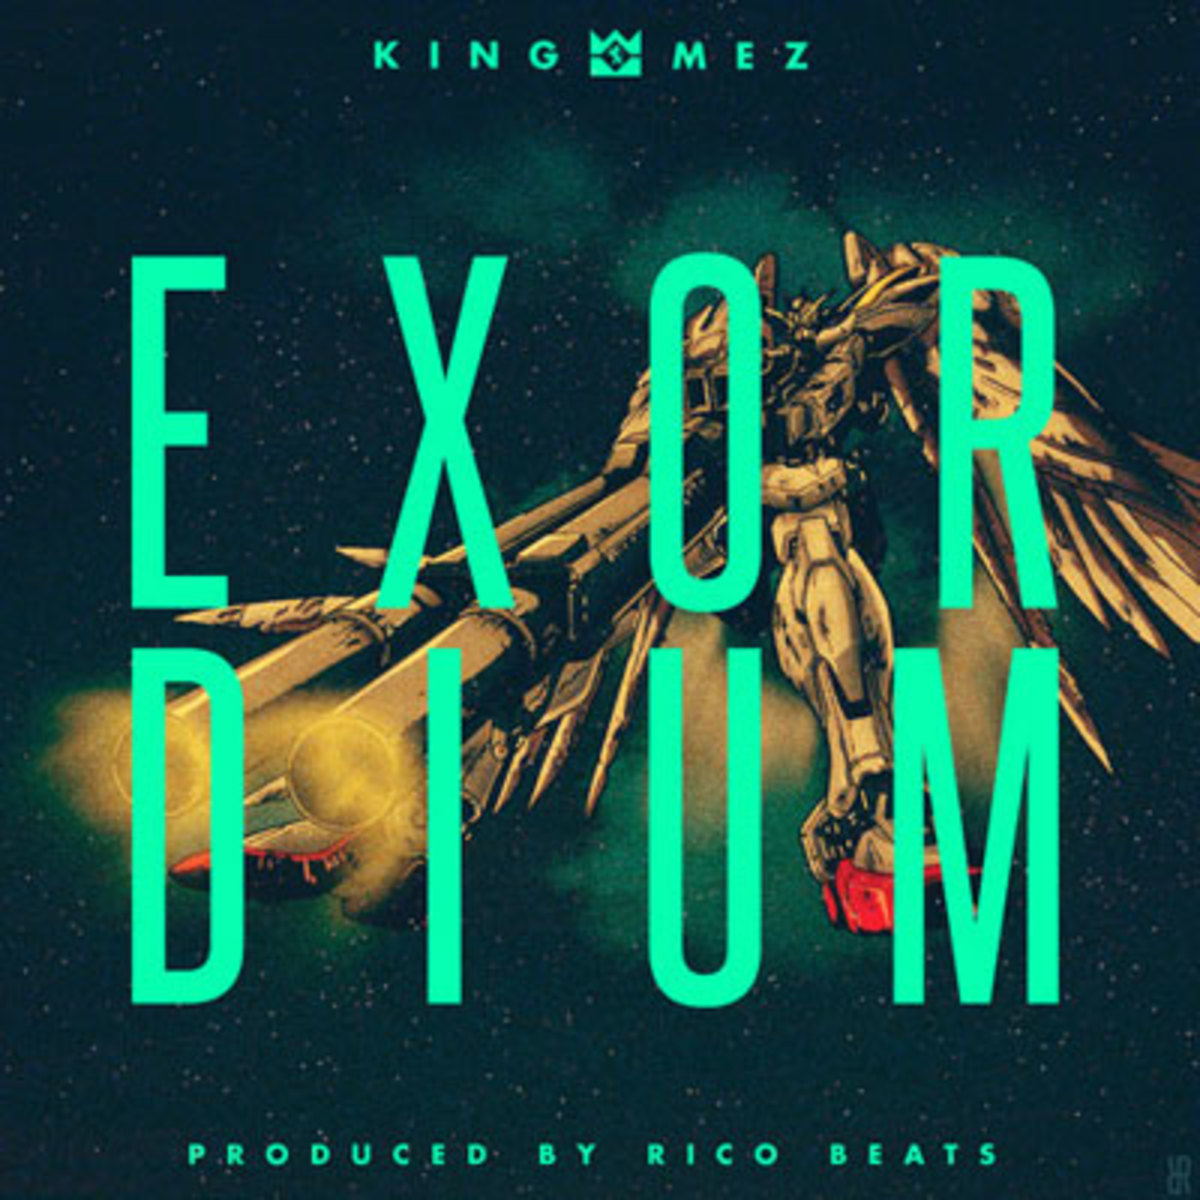 kingmez-exordium.jpg